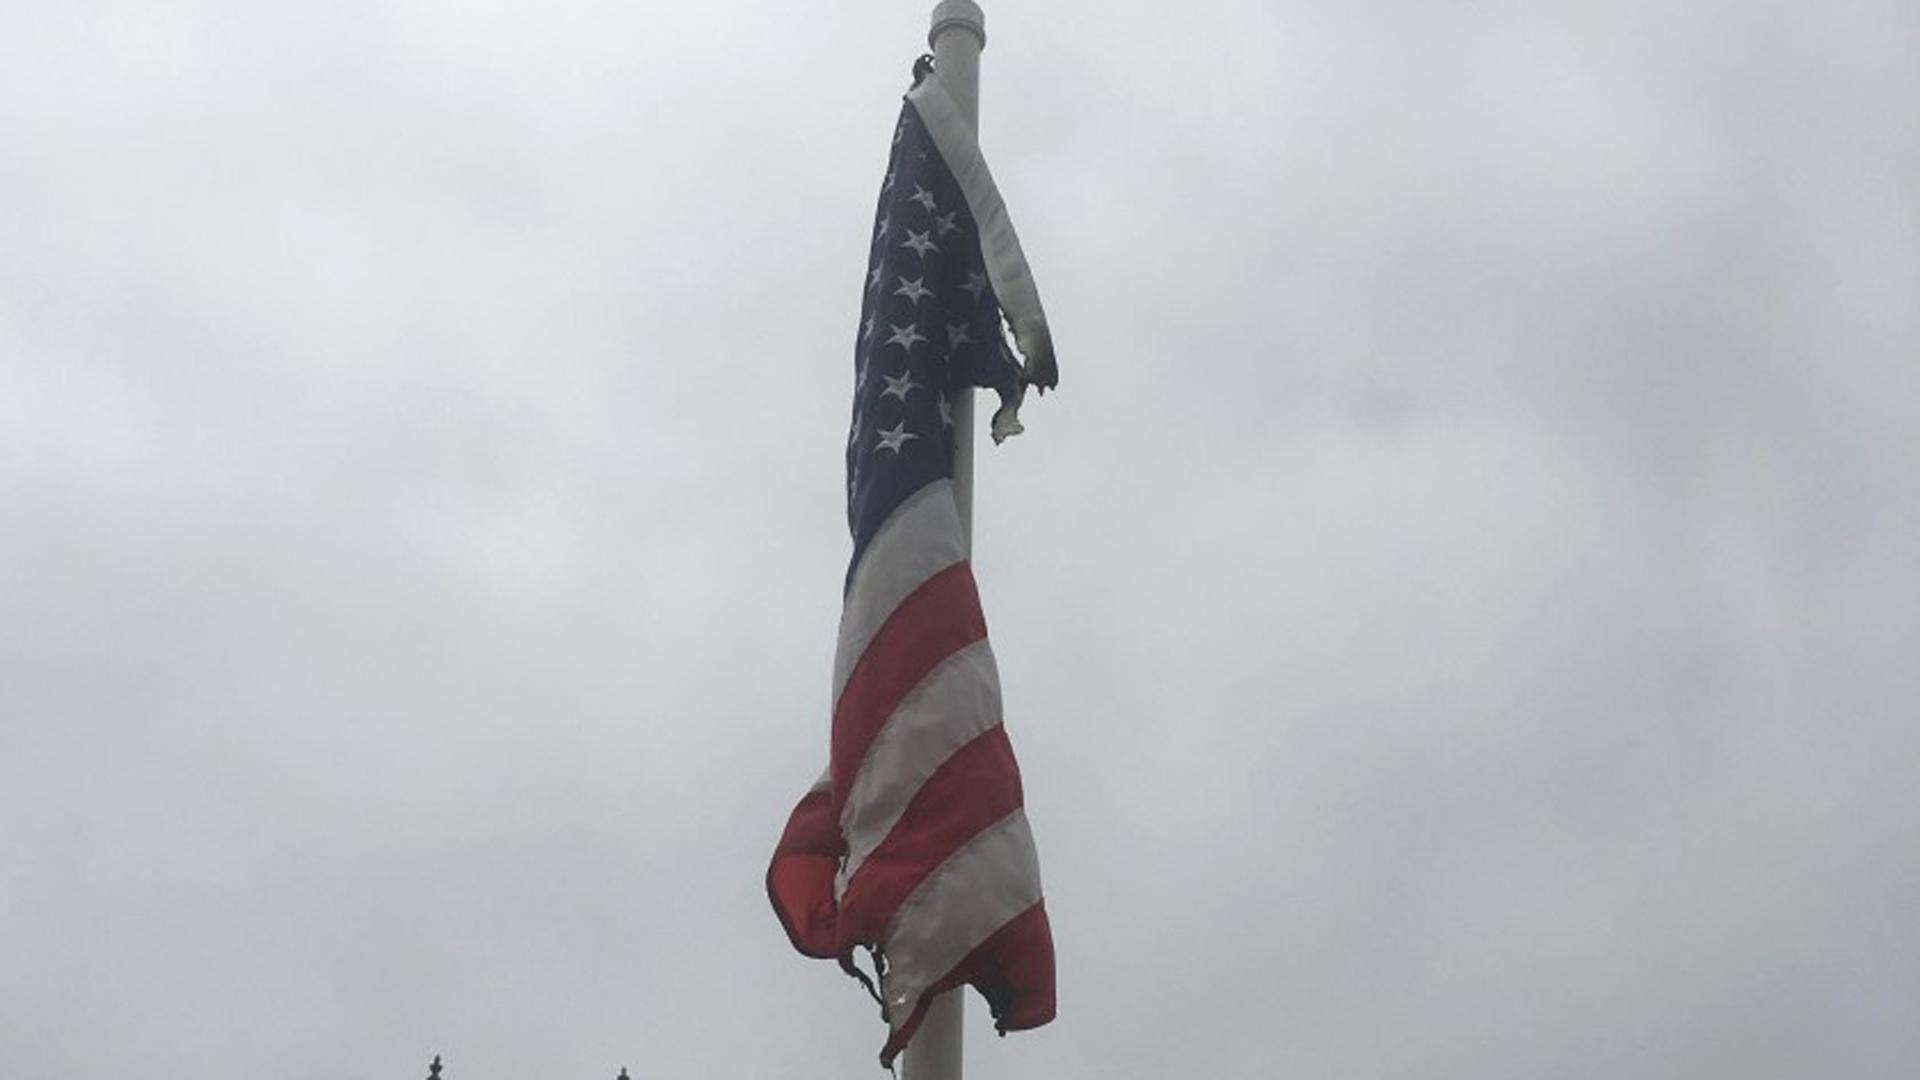 A burned American flag hanging at the Balboa Island bridge in Newport Beach. (Credit: Jack Callahan/ Balboa Island Improvement Assn. via Los Angeles Times)